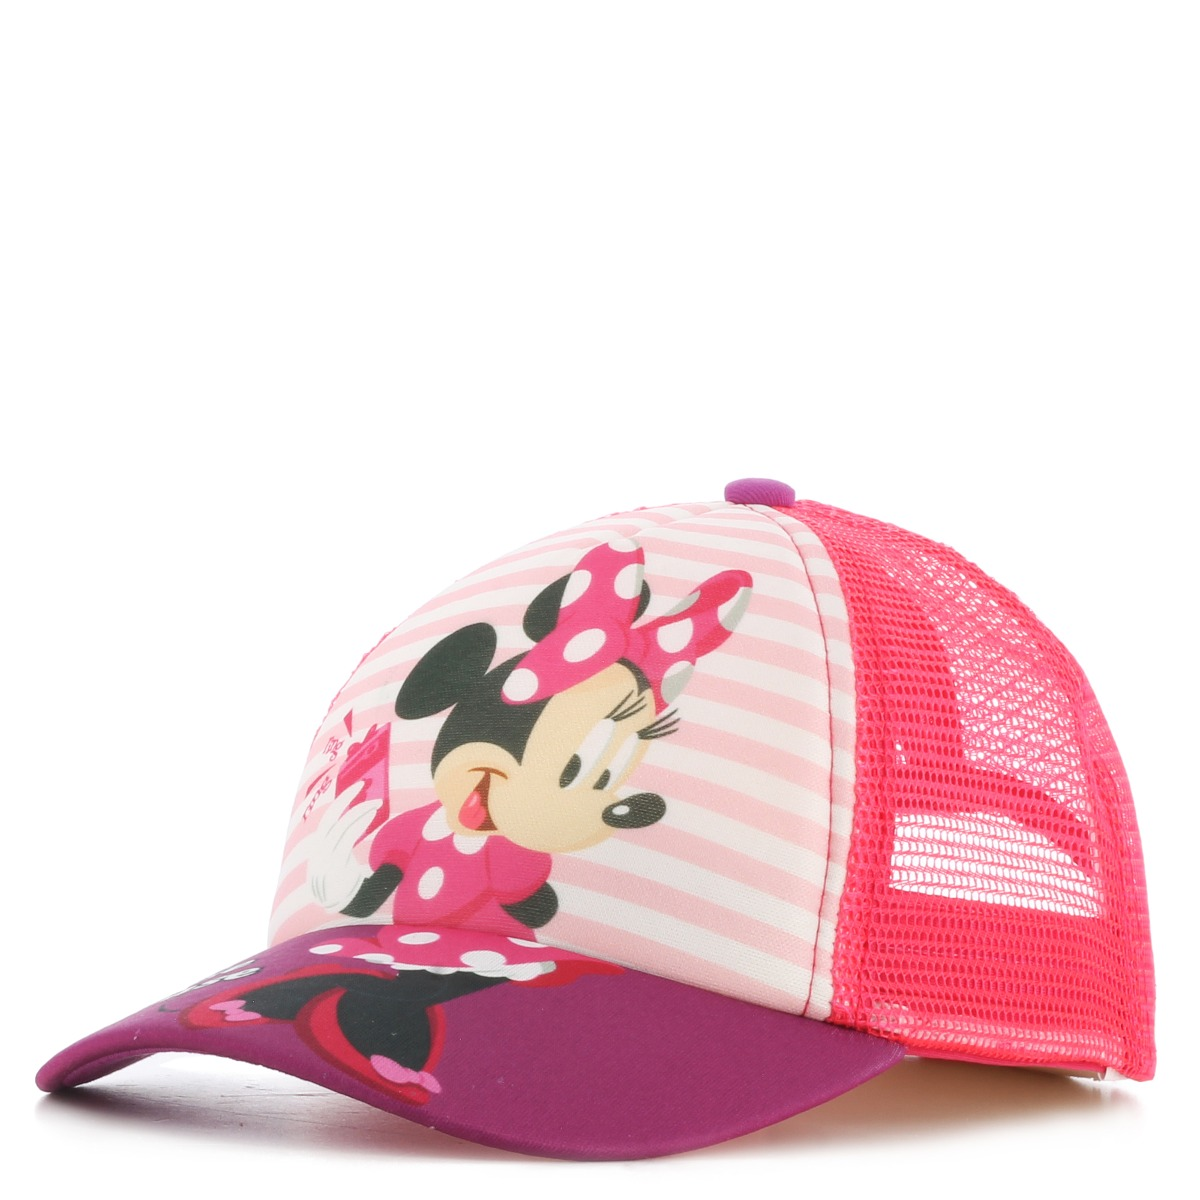 Gorro Niñas Disney Minnie131.359010873 -   269 0e155cdf56f